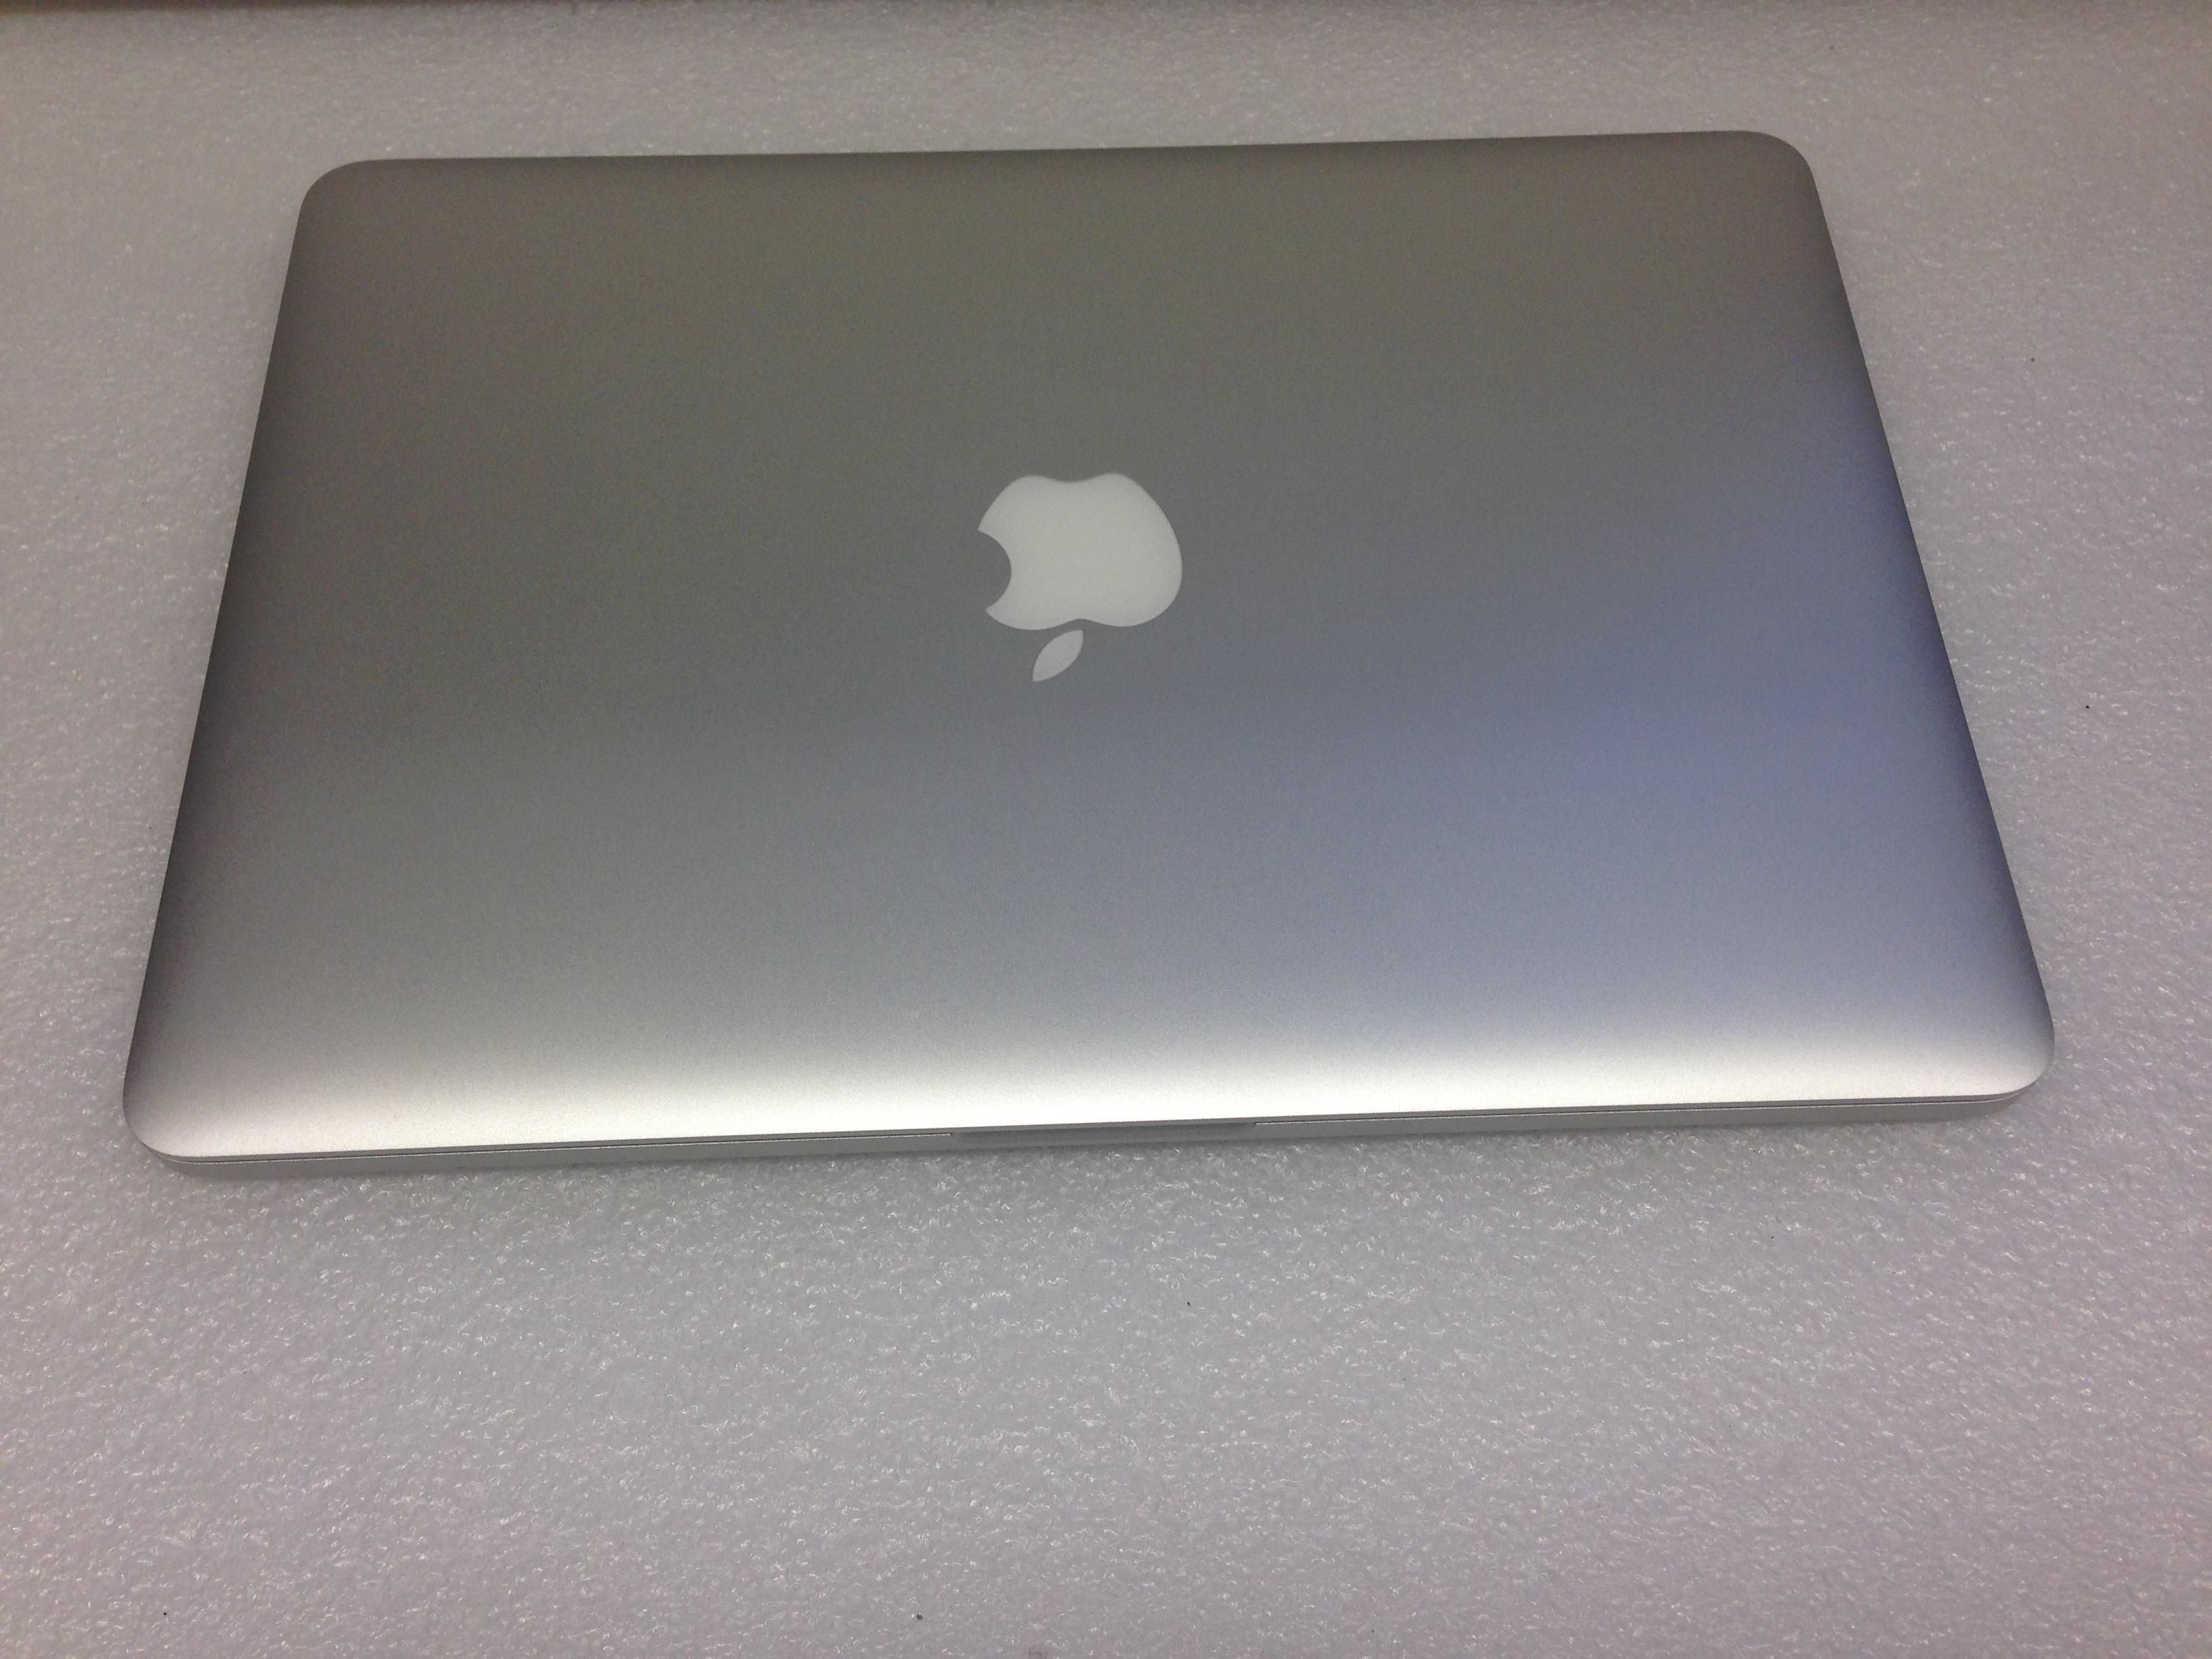 MacBook Pro (Retina 13-inch Mid 2014), DUAL CORE INTEL CORE i5 2,6 GHZ, 8 GB, SSD 128GB, imagen 2